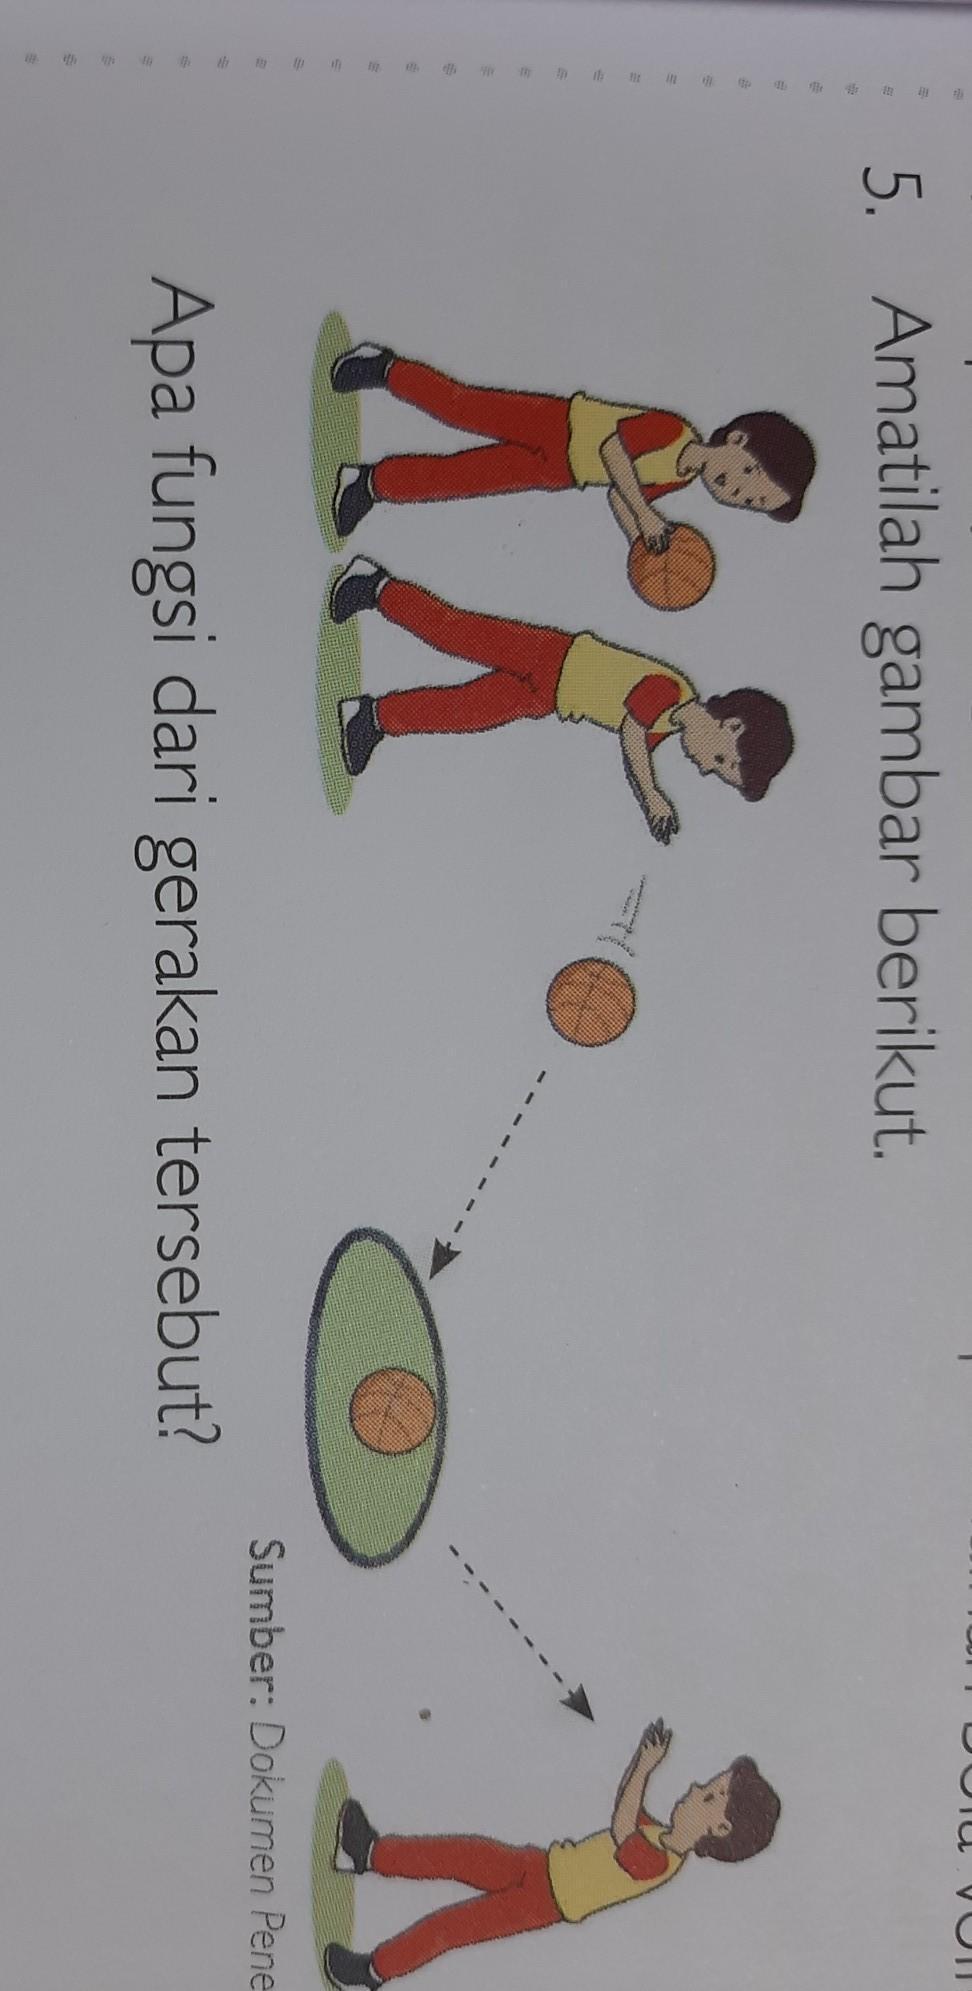 Sebutkan Tujuan Dari Permainan Sepak Bola : sebutkan, tujuan, permainan, sepak, Jelaskan, Tujuan, Menggiring, Dalam, Permainan, Sepak, Bola.2., Tuliskan, Langkah, Brainly.co.id